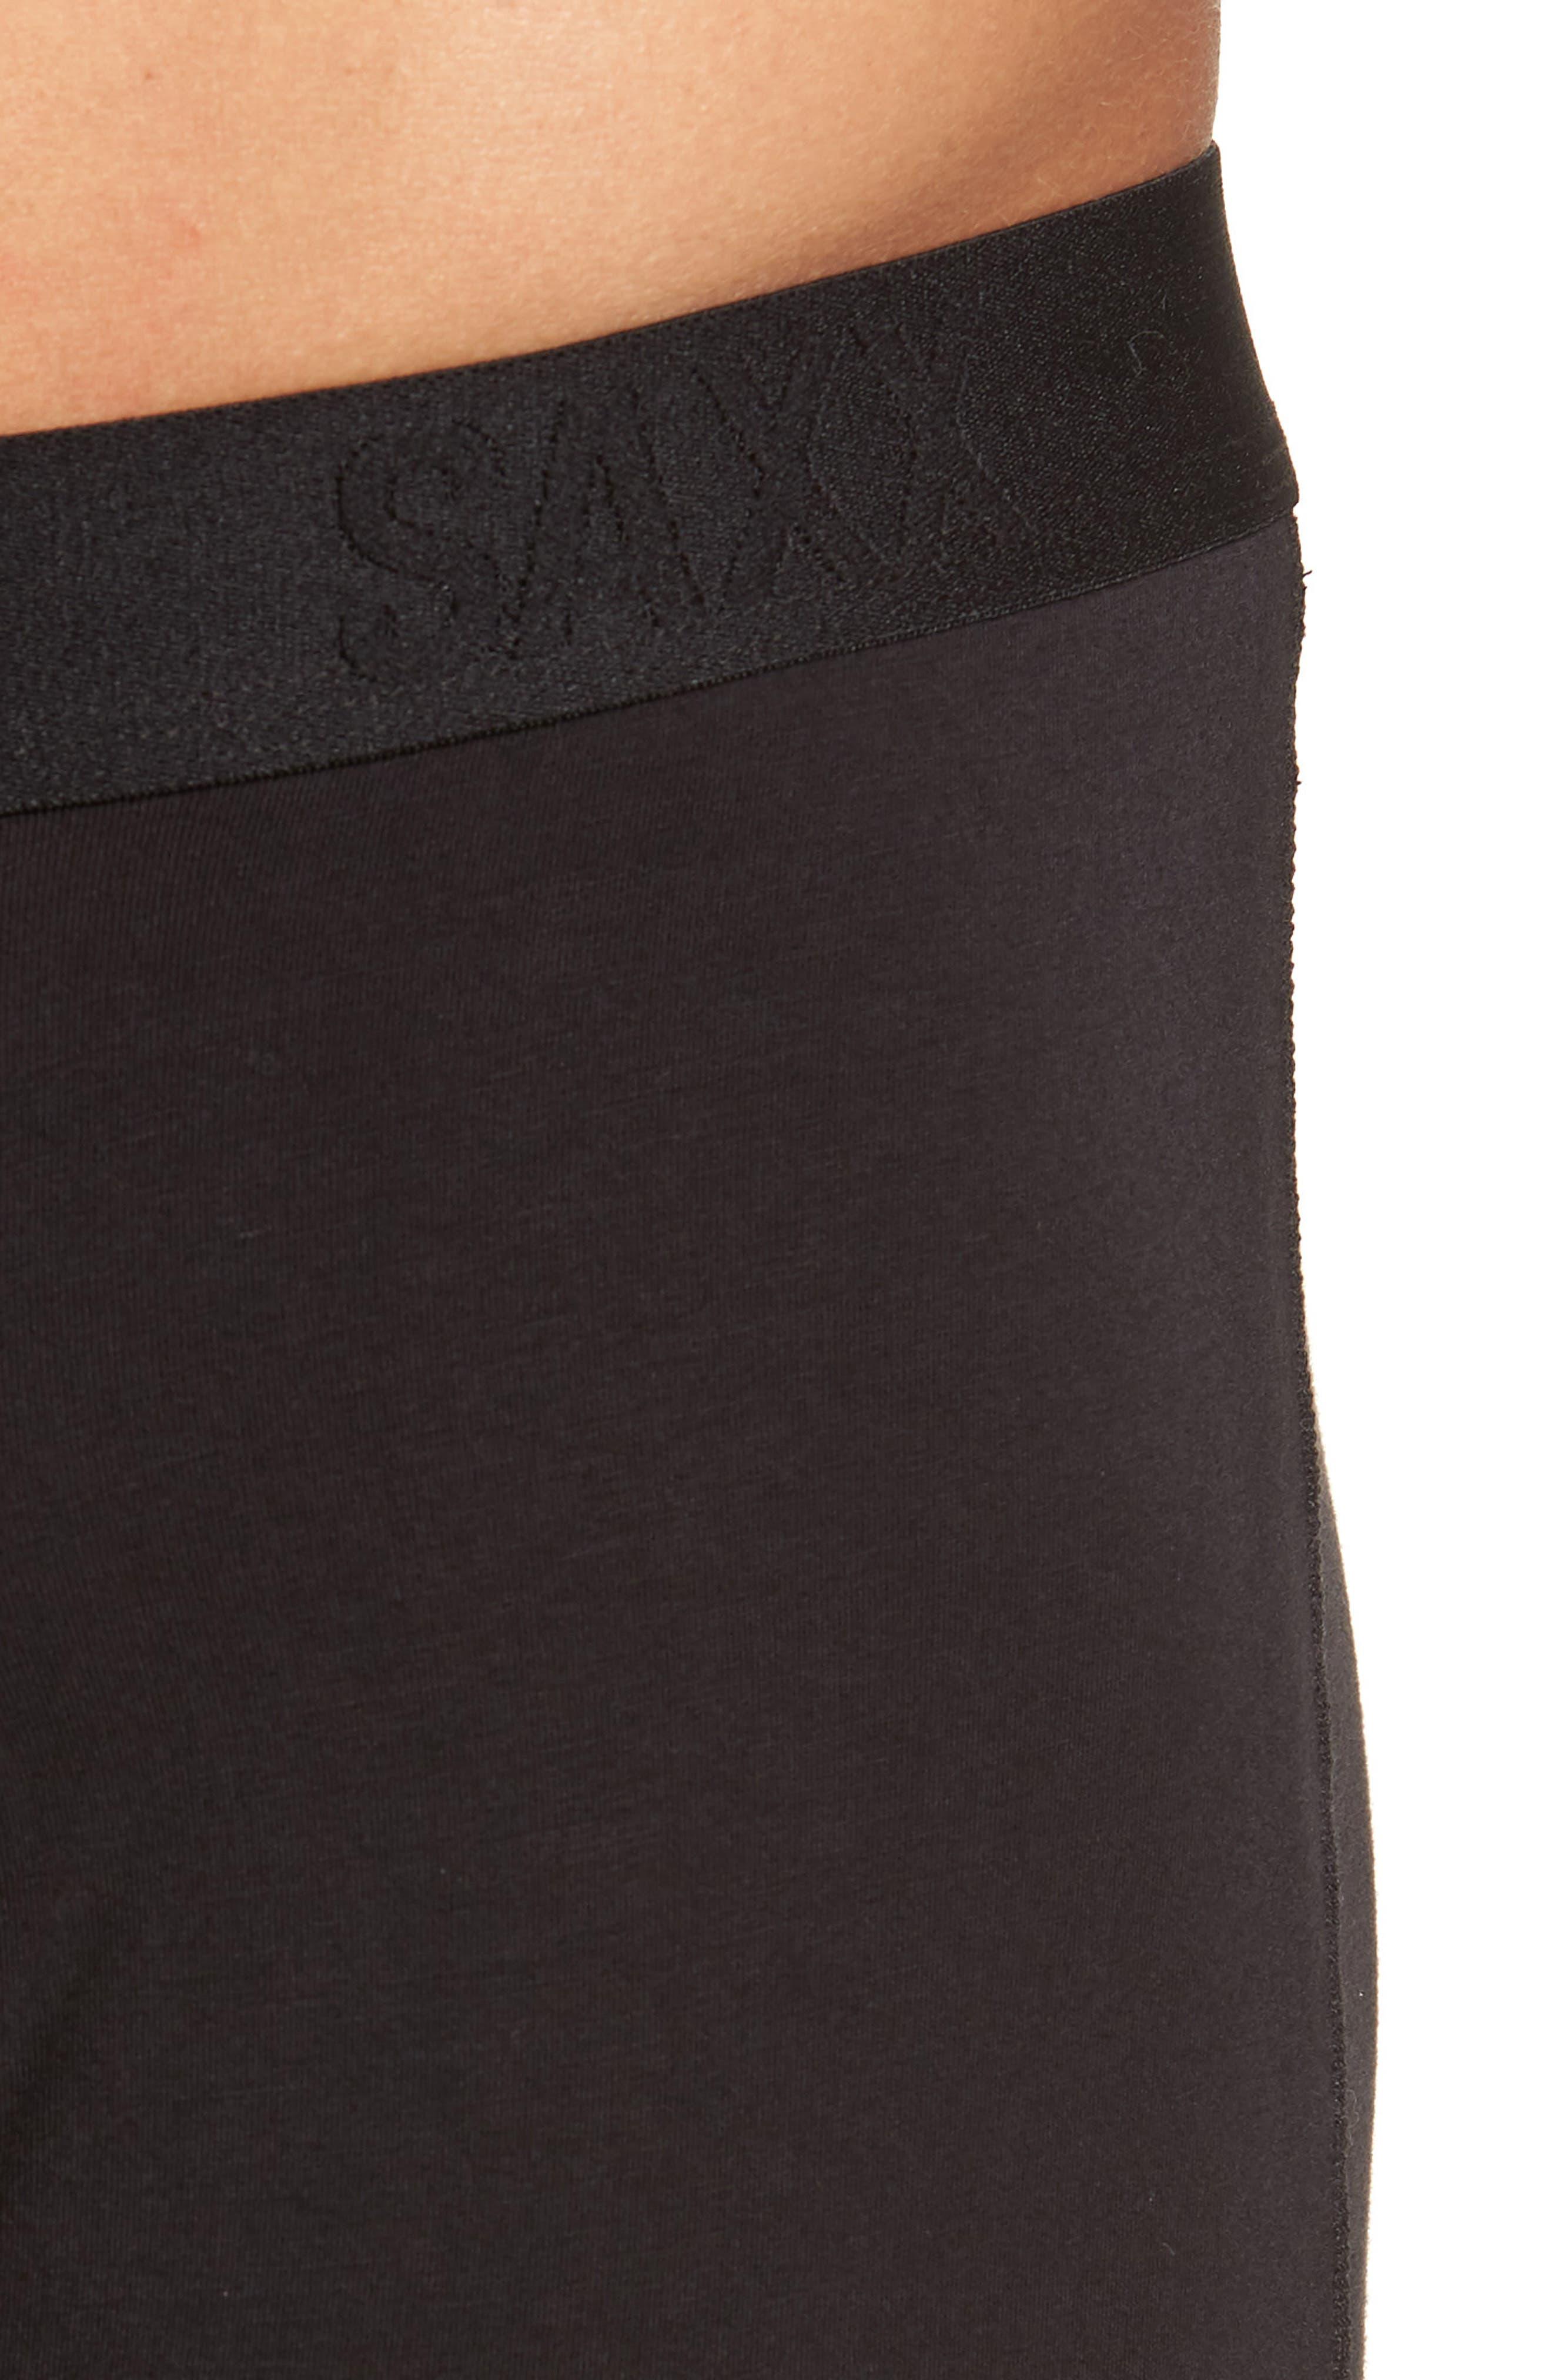 SAXX, 'Ultra' Stretch Boxer Briefs, Alternate thumbnail 4, color, BLACK/ BLACK